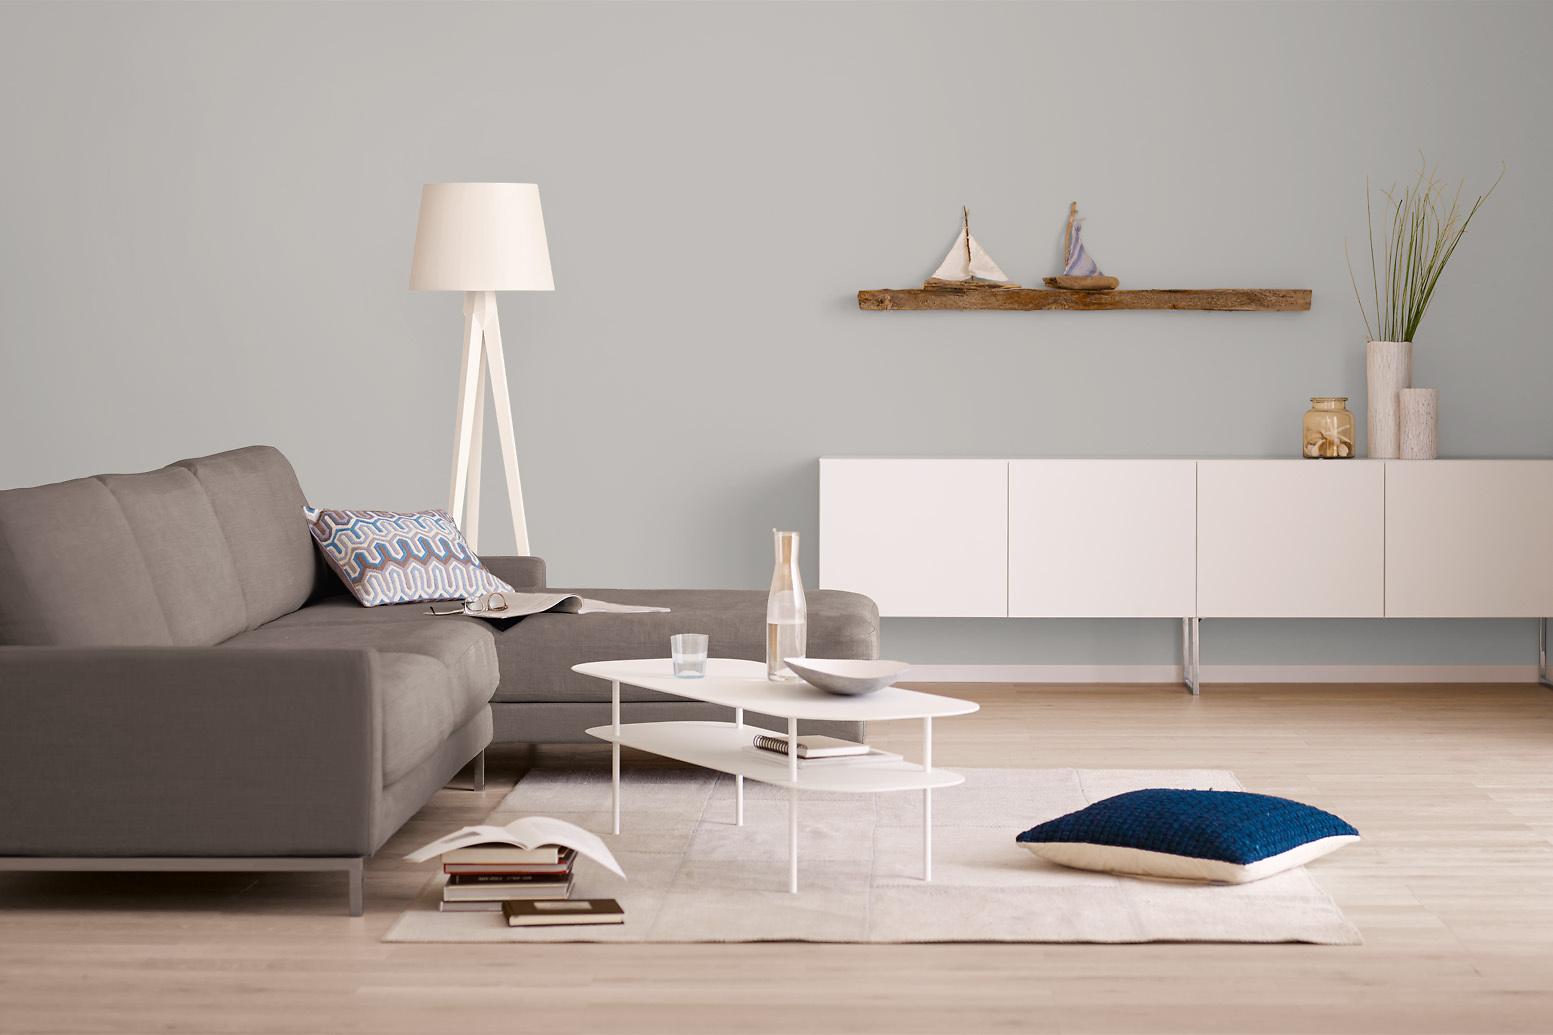 innenfarbe in grau nebelgrau streichen alpina. Black Bedroom Furniture Sets. Home Design Ideas